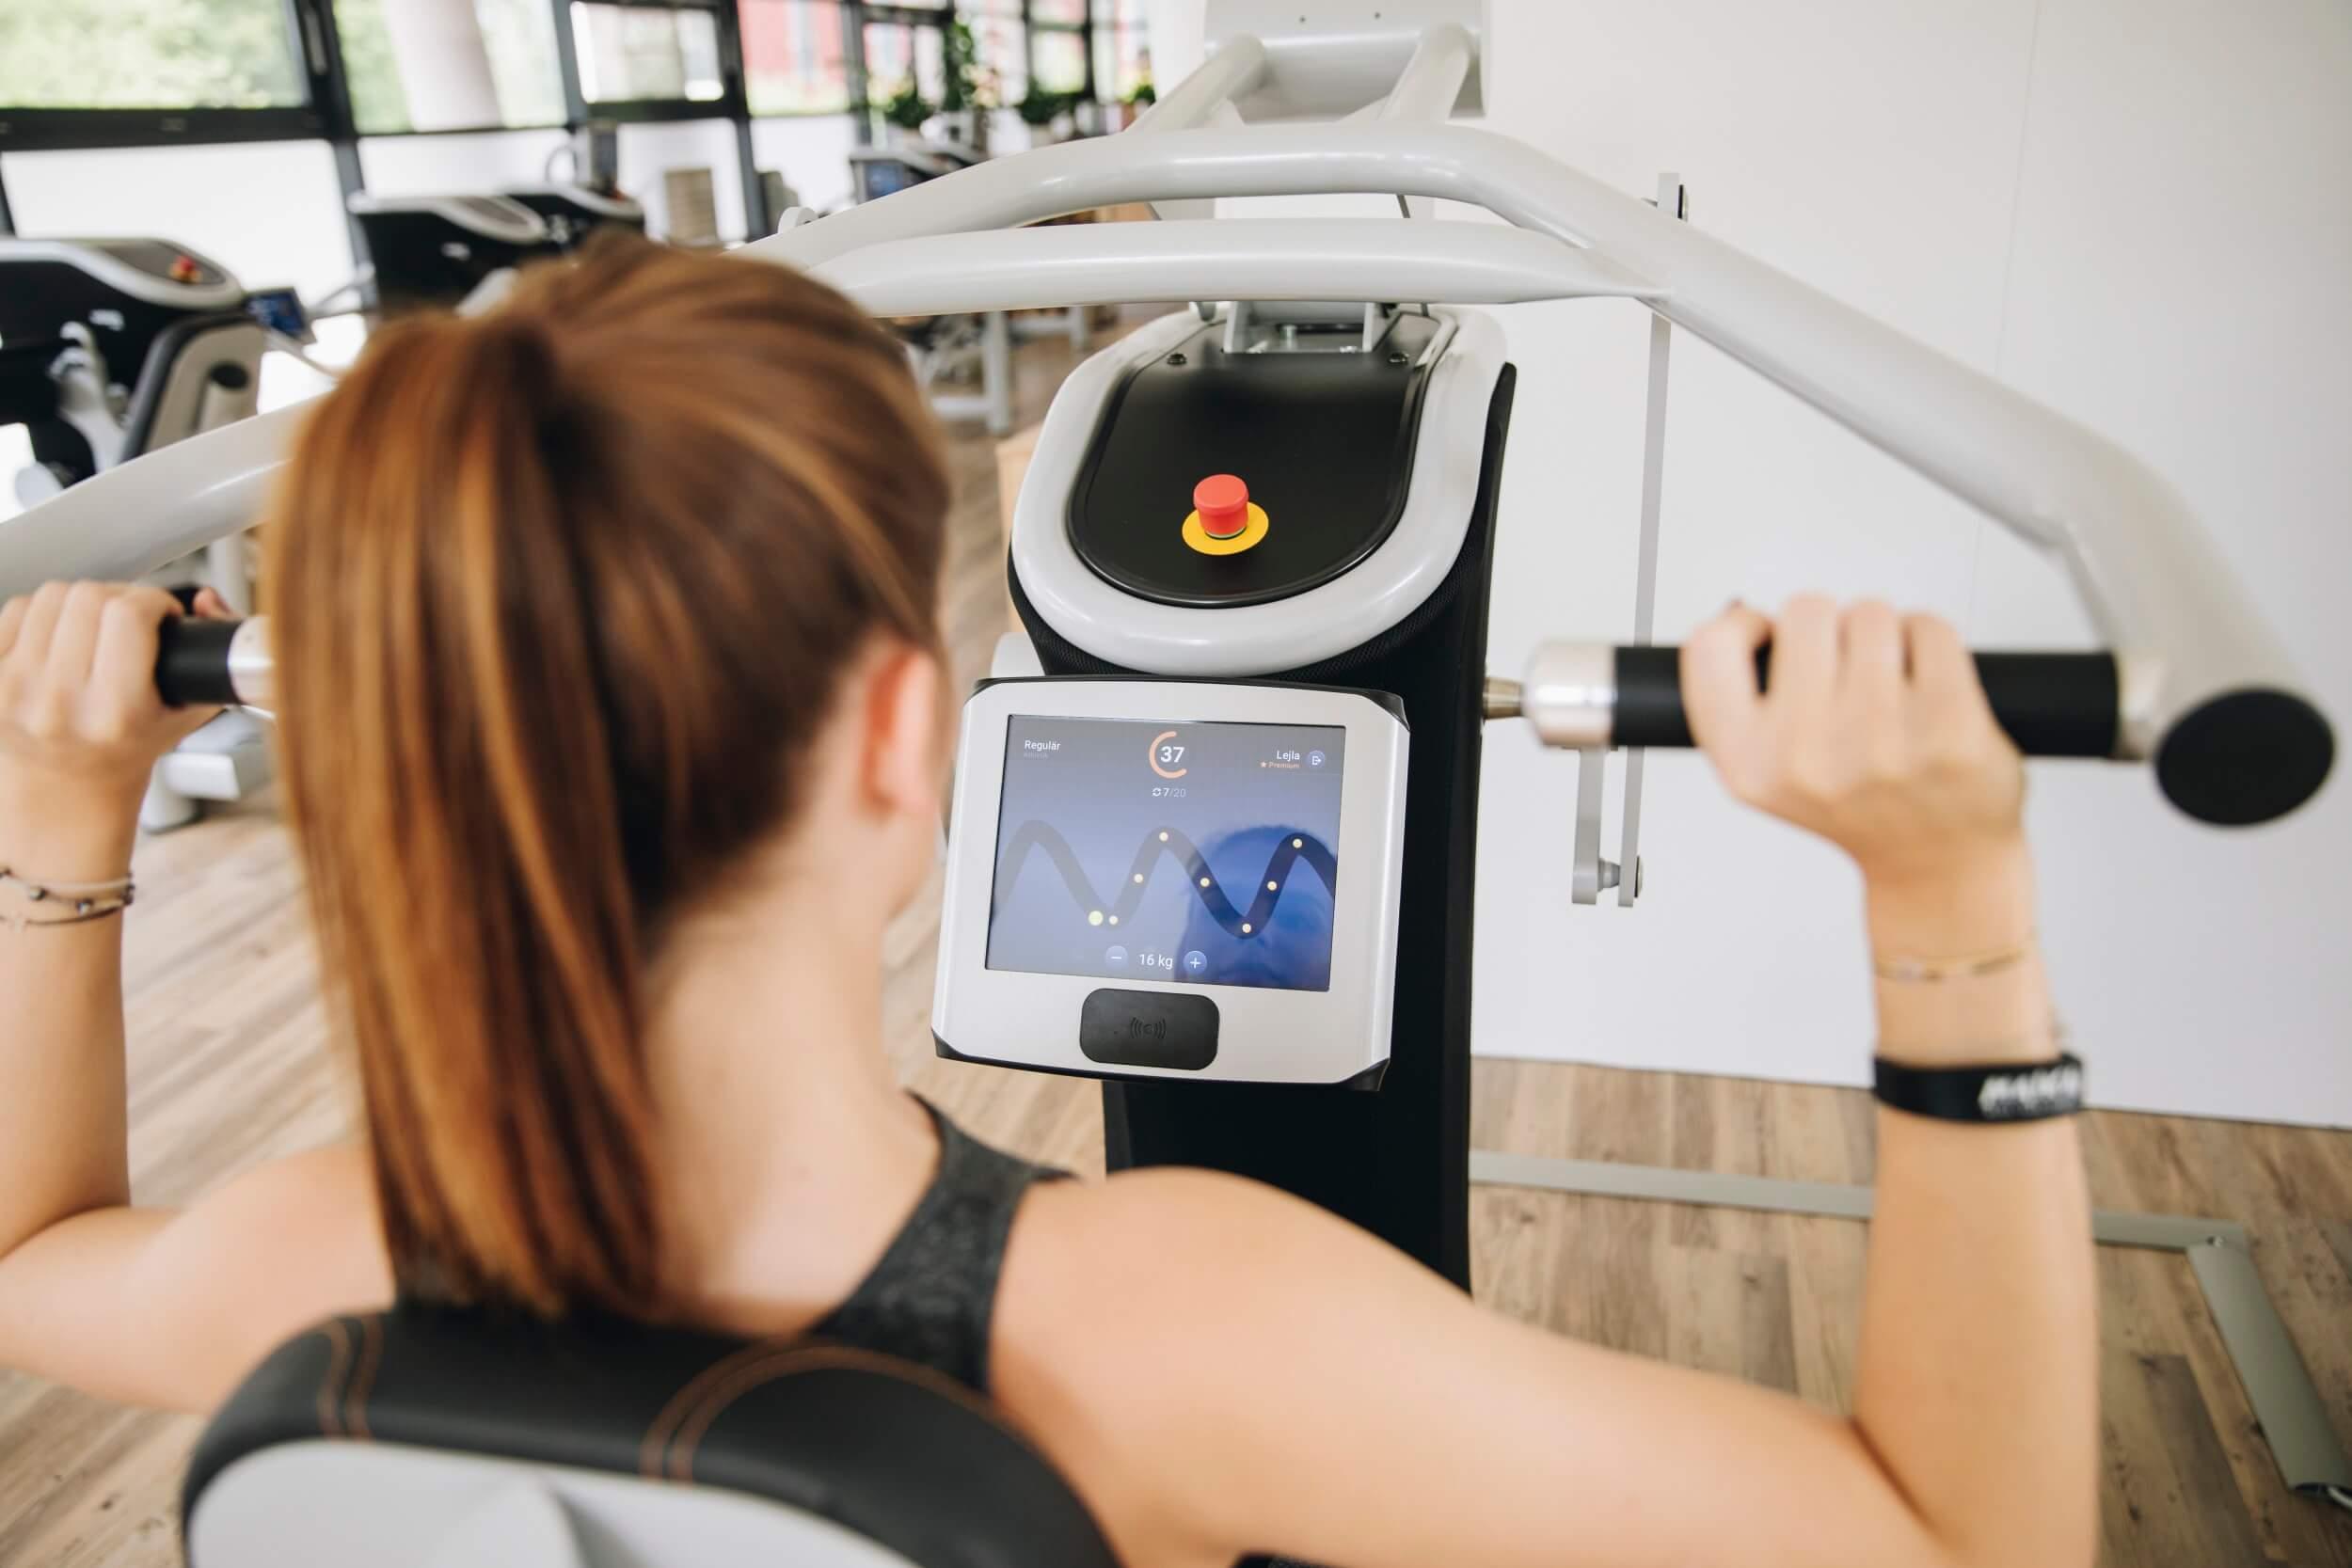 Trainingskurze Schulterpresse MAIKAI Fitness